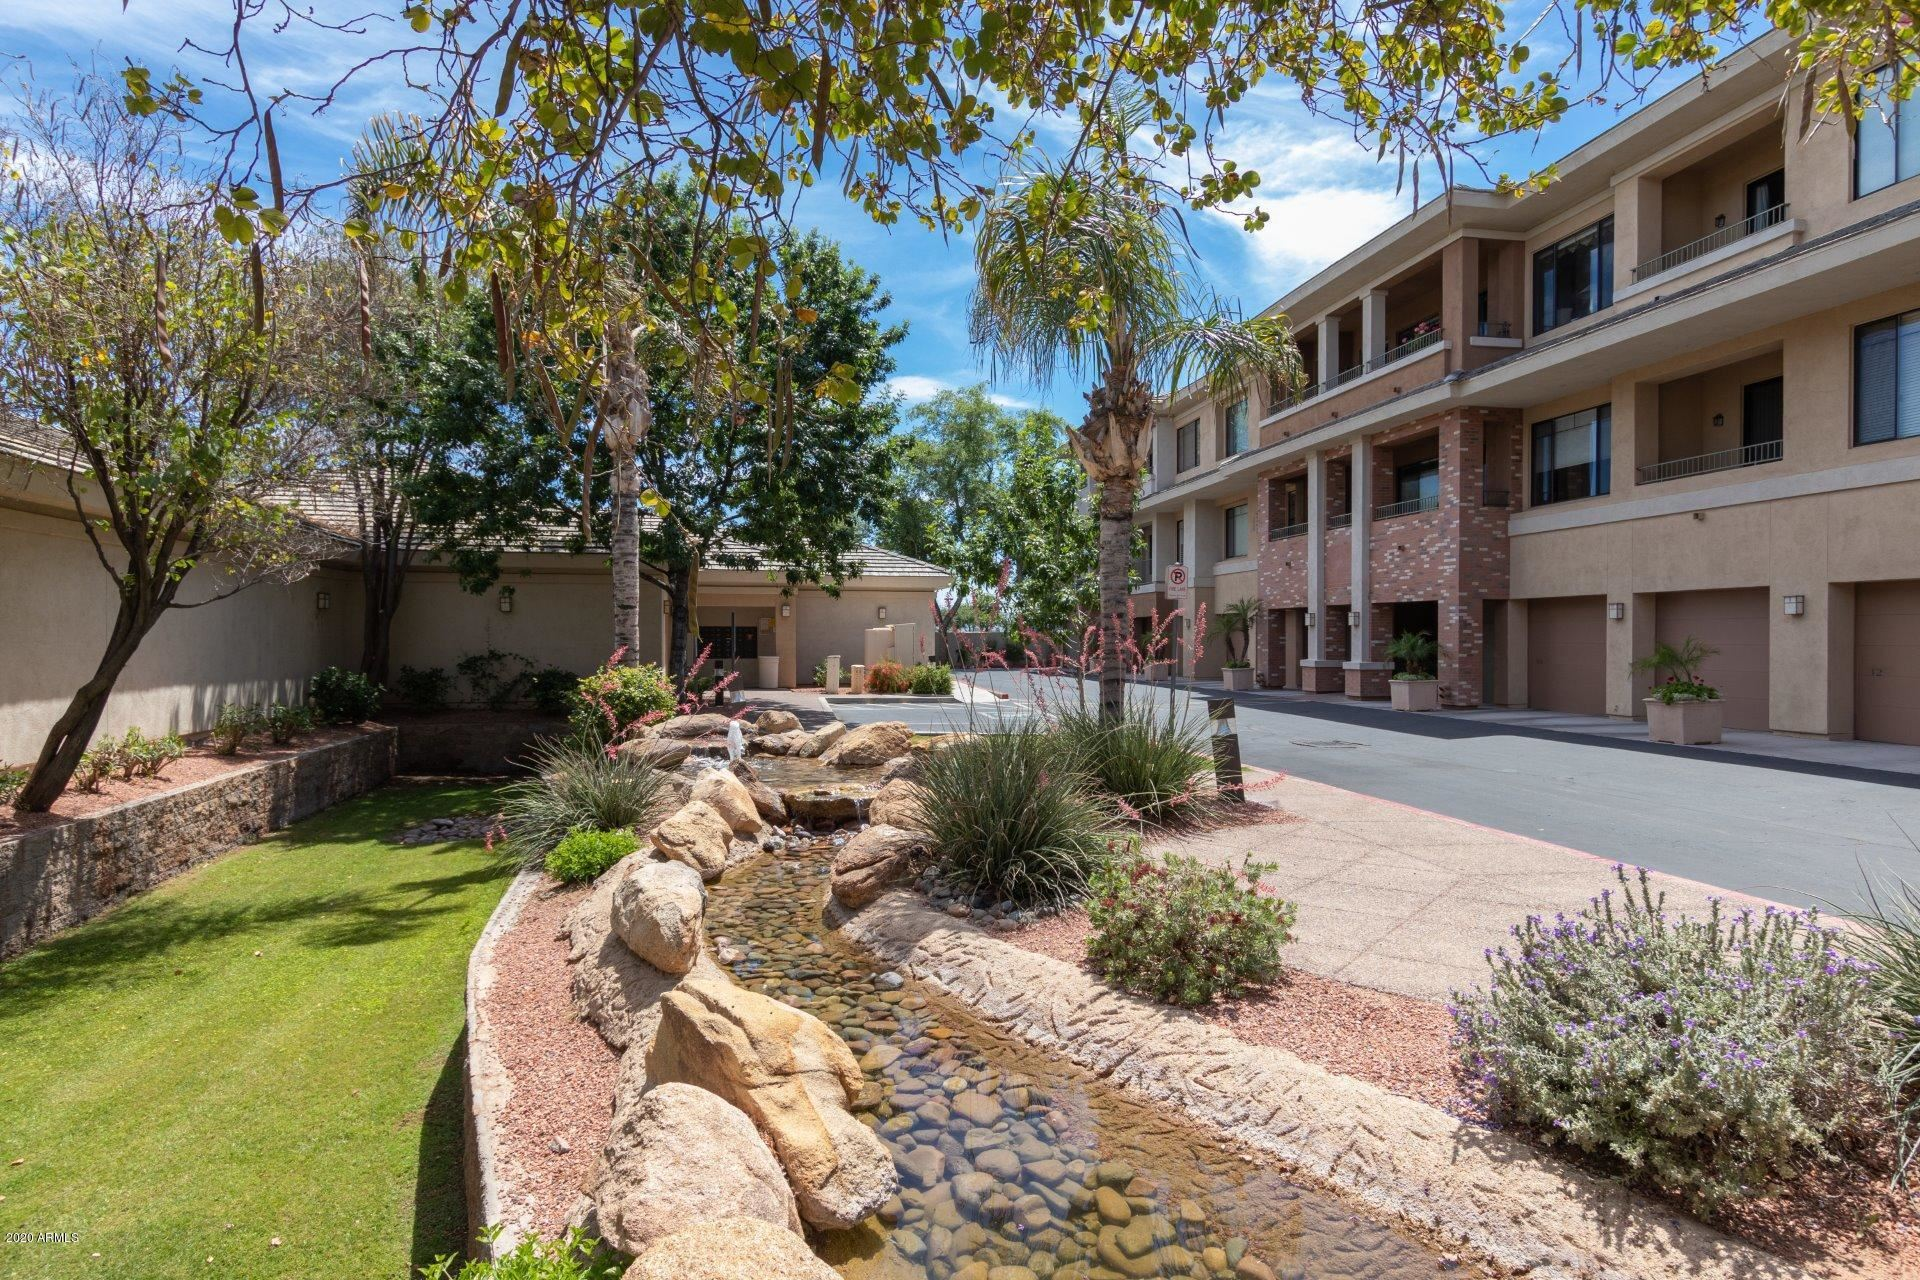 2989 N 44TH Street #1003, Phoenix, AZ 85018 - MLS#: 6075219